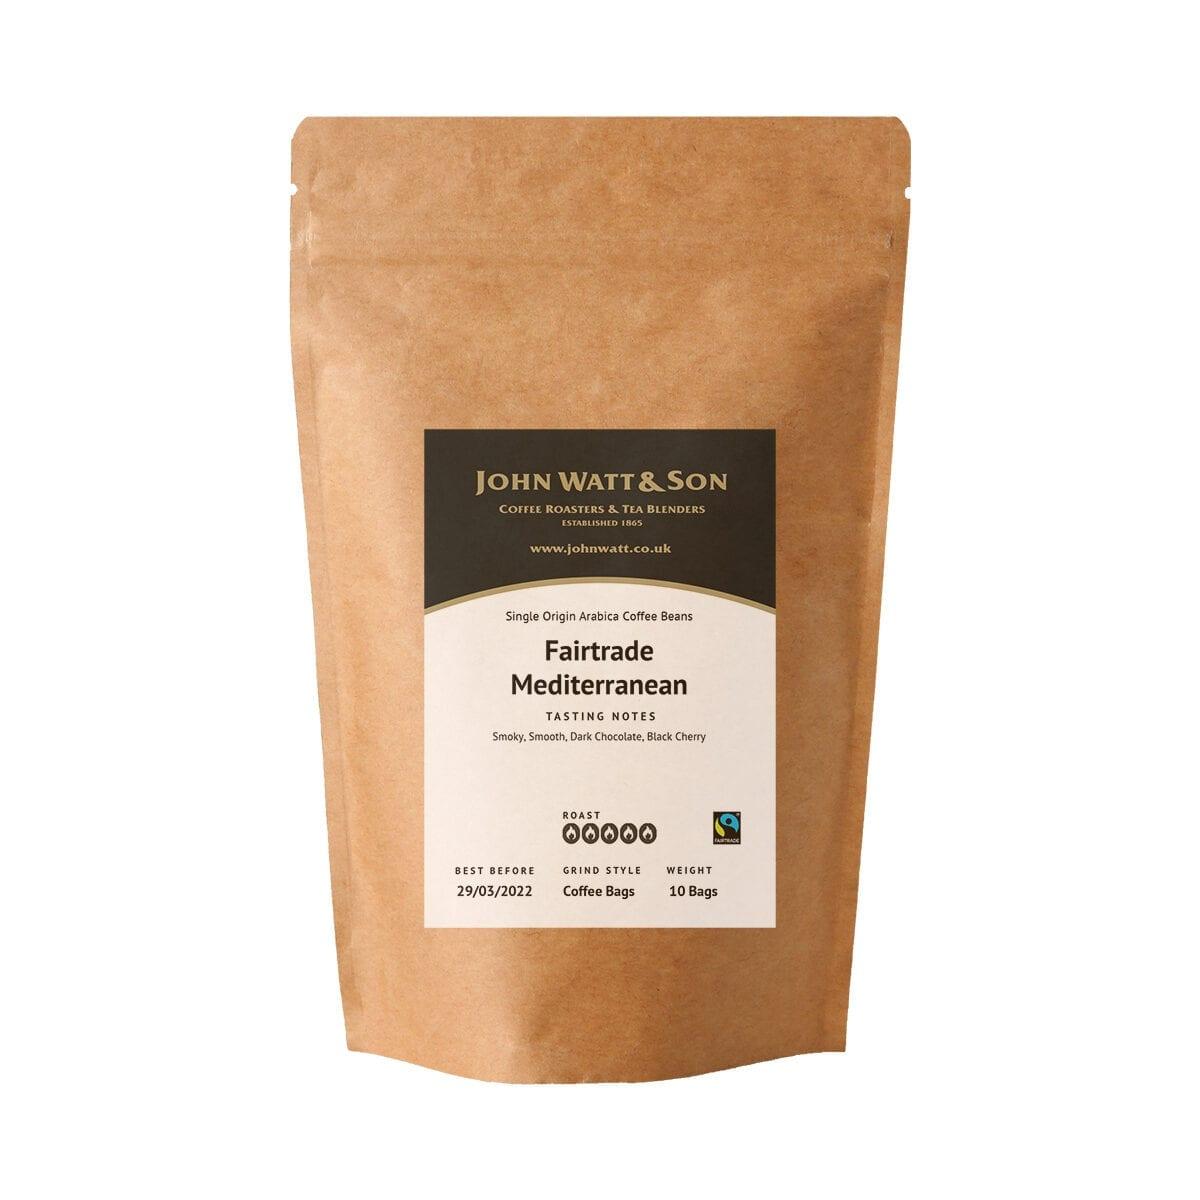 Fairtrade Mediterranean Coffeebags